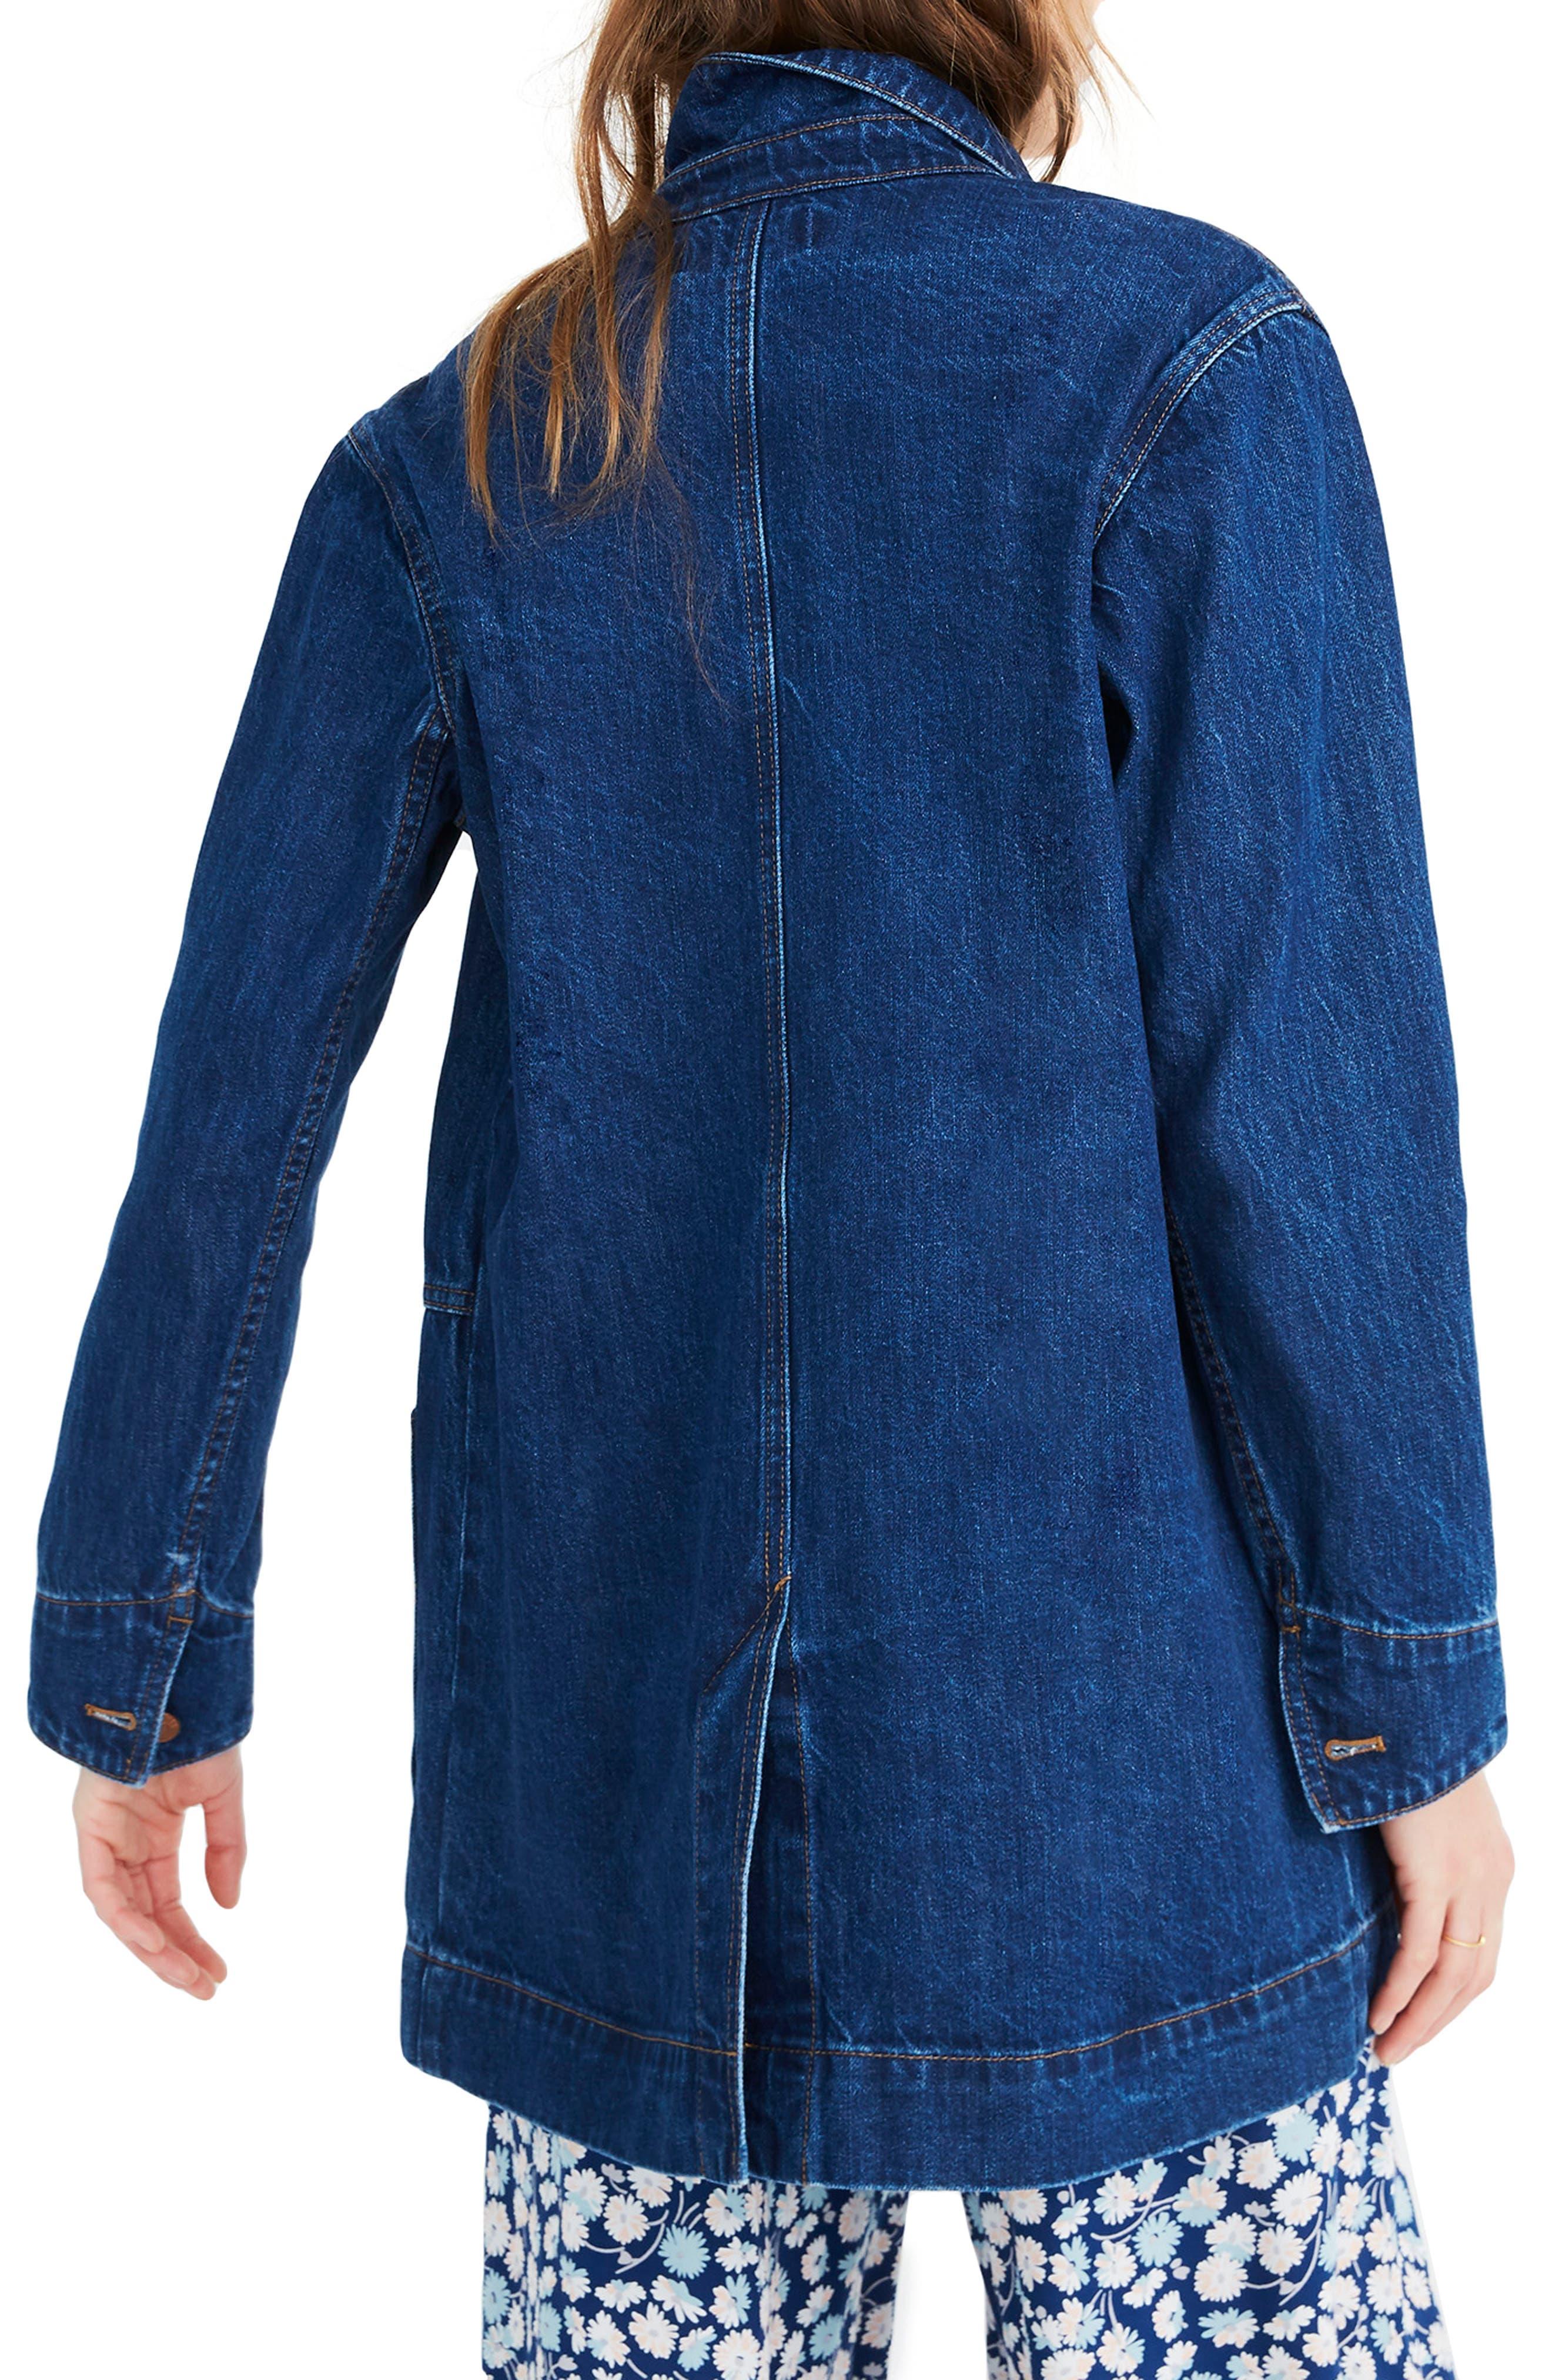 MADEWELL, Oversized Denim Chore Jacket, Alternate thumbnail 2, color, 400